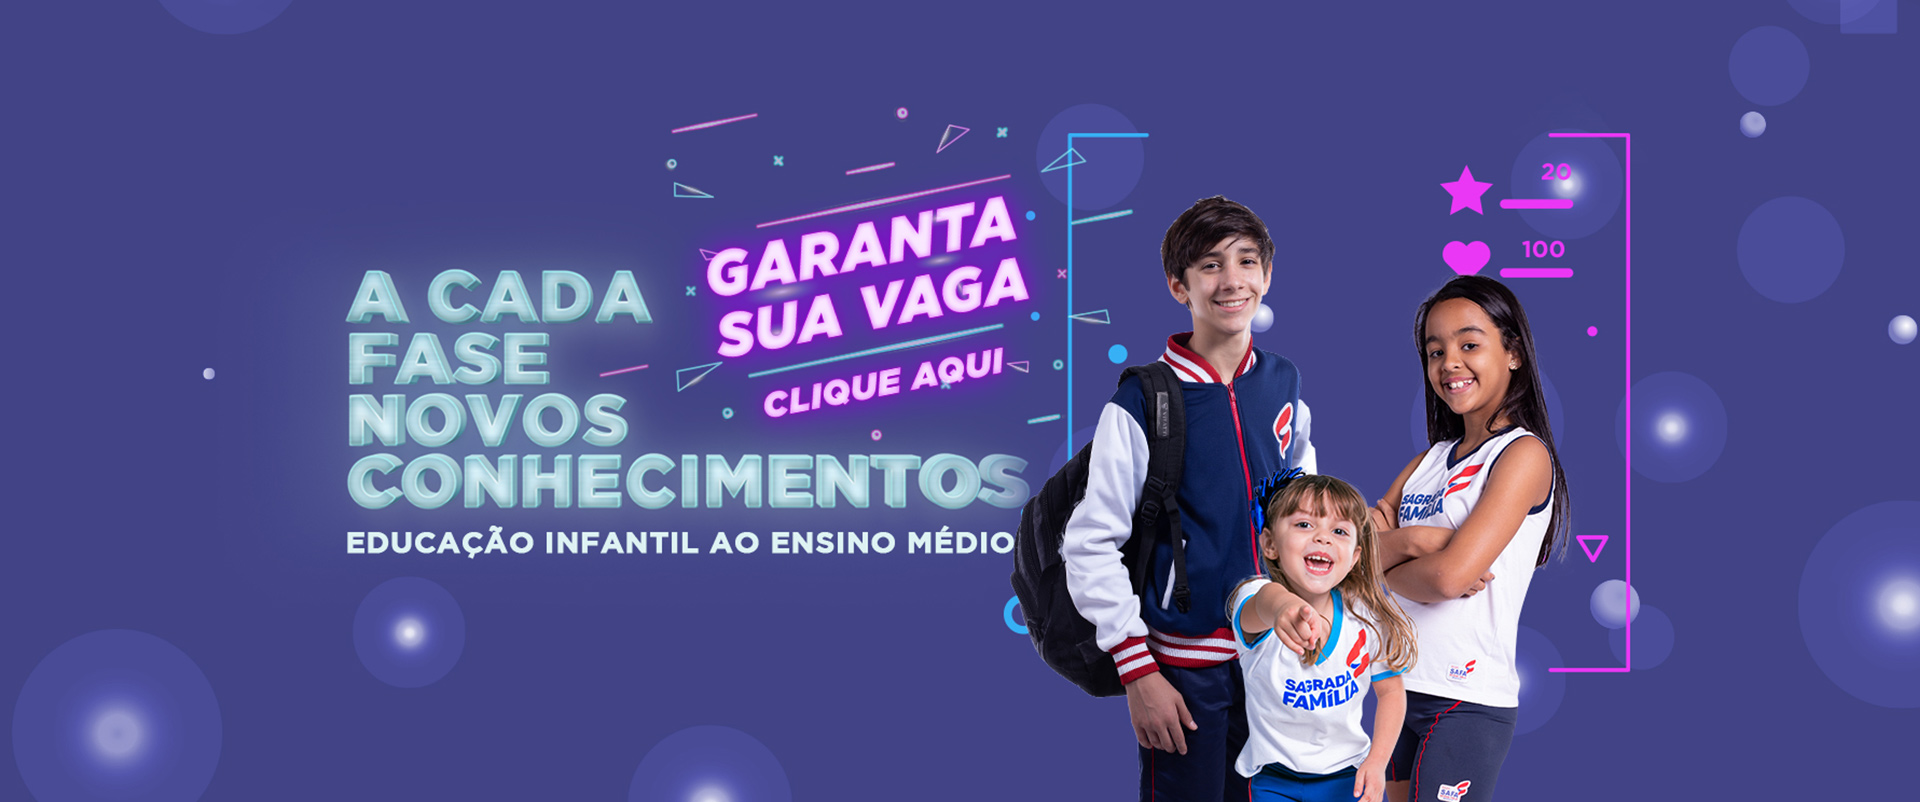 http://safa.com.br/site/wp-content/uploads/2020/02/banner-safa-dimensao.jpg